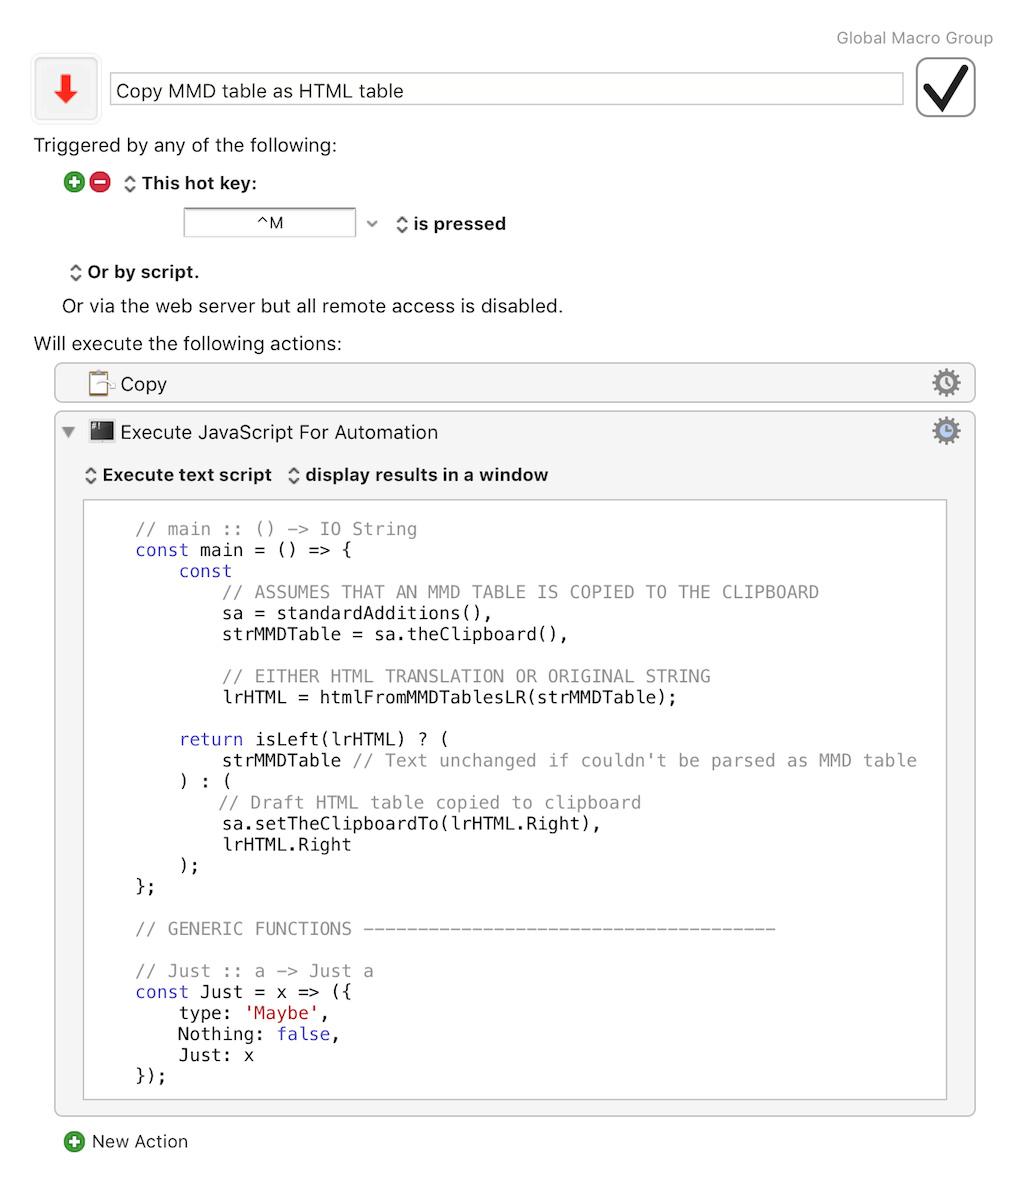 Copy MultiMarkdown table as HTML code - Macro Library